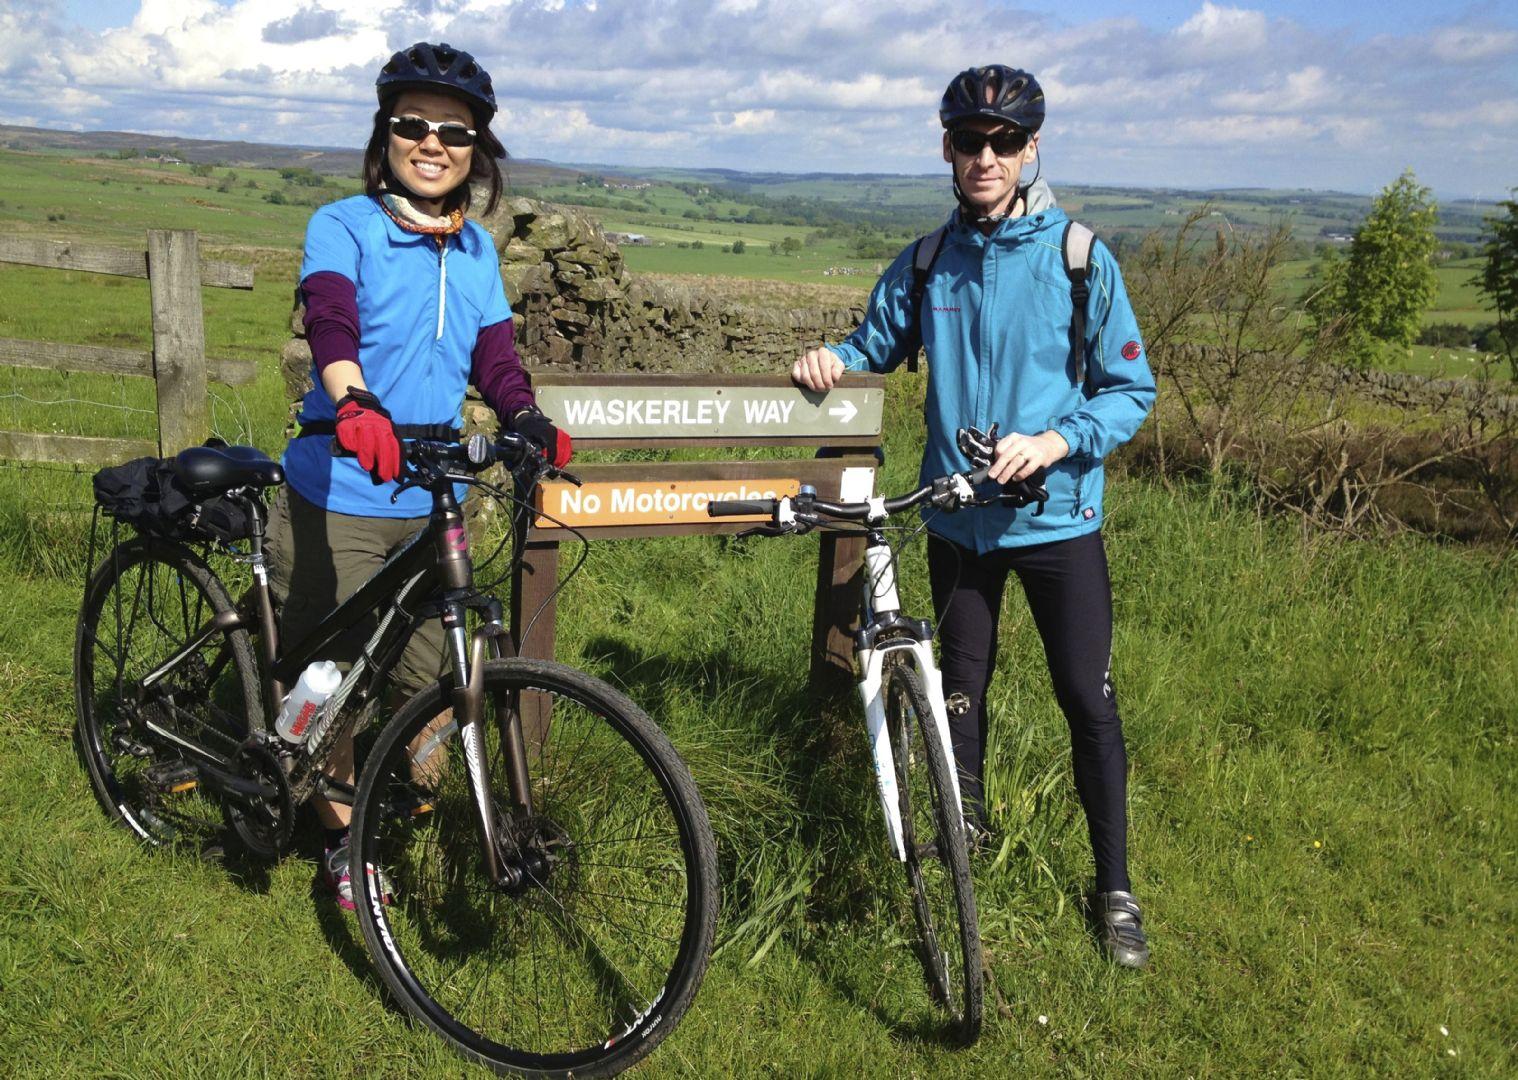 _Customer.103238.16258.jpg - UK - C2C - Coast to Coast 4 Days Cycling - Self-Guided Leisure Cycling Holiday - Leisure Cycling